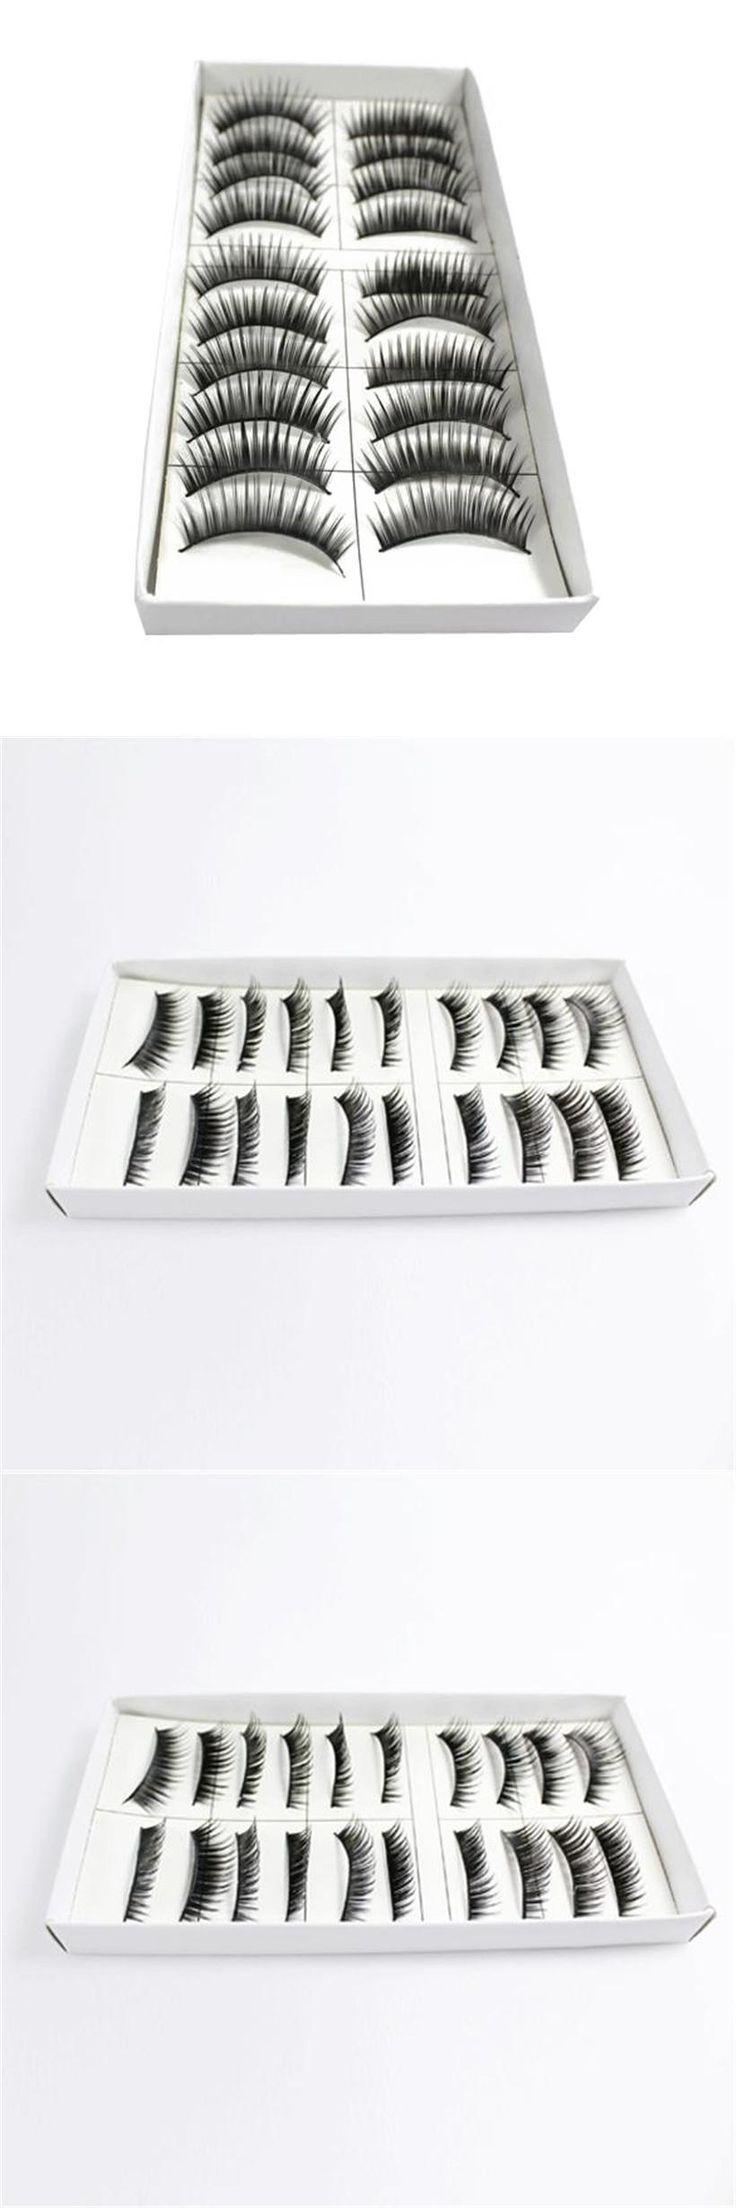 [Visit to Buy] 10 Pair Thick Long False Eyelashes Eye Lashes Makeup (Valse wimpers Faux cils Pestanas postizas) #Advertisement